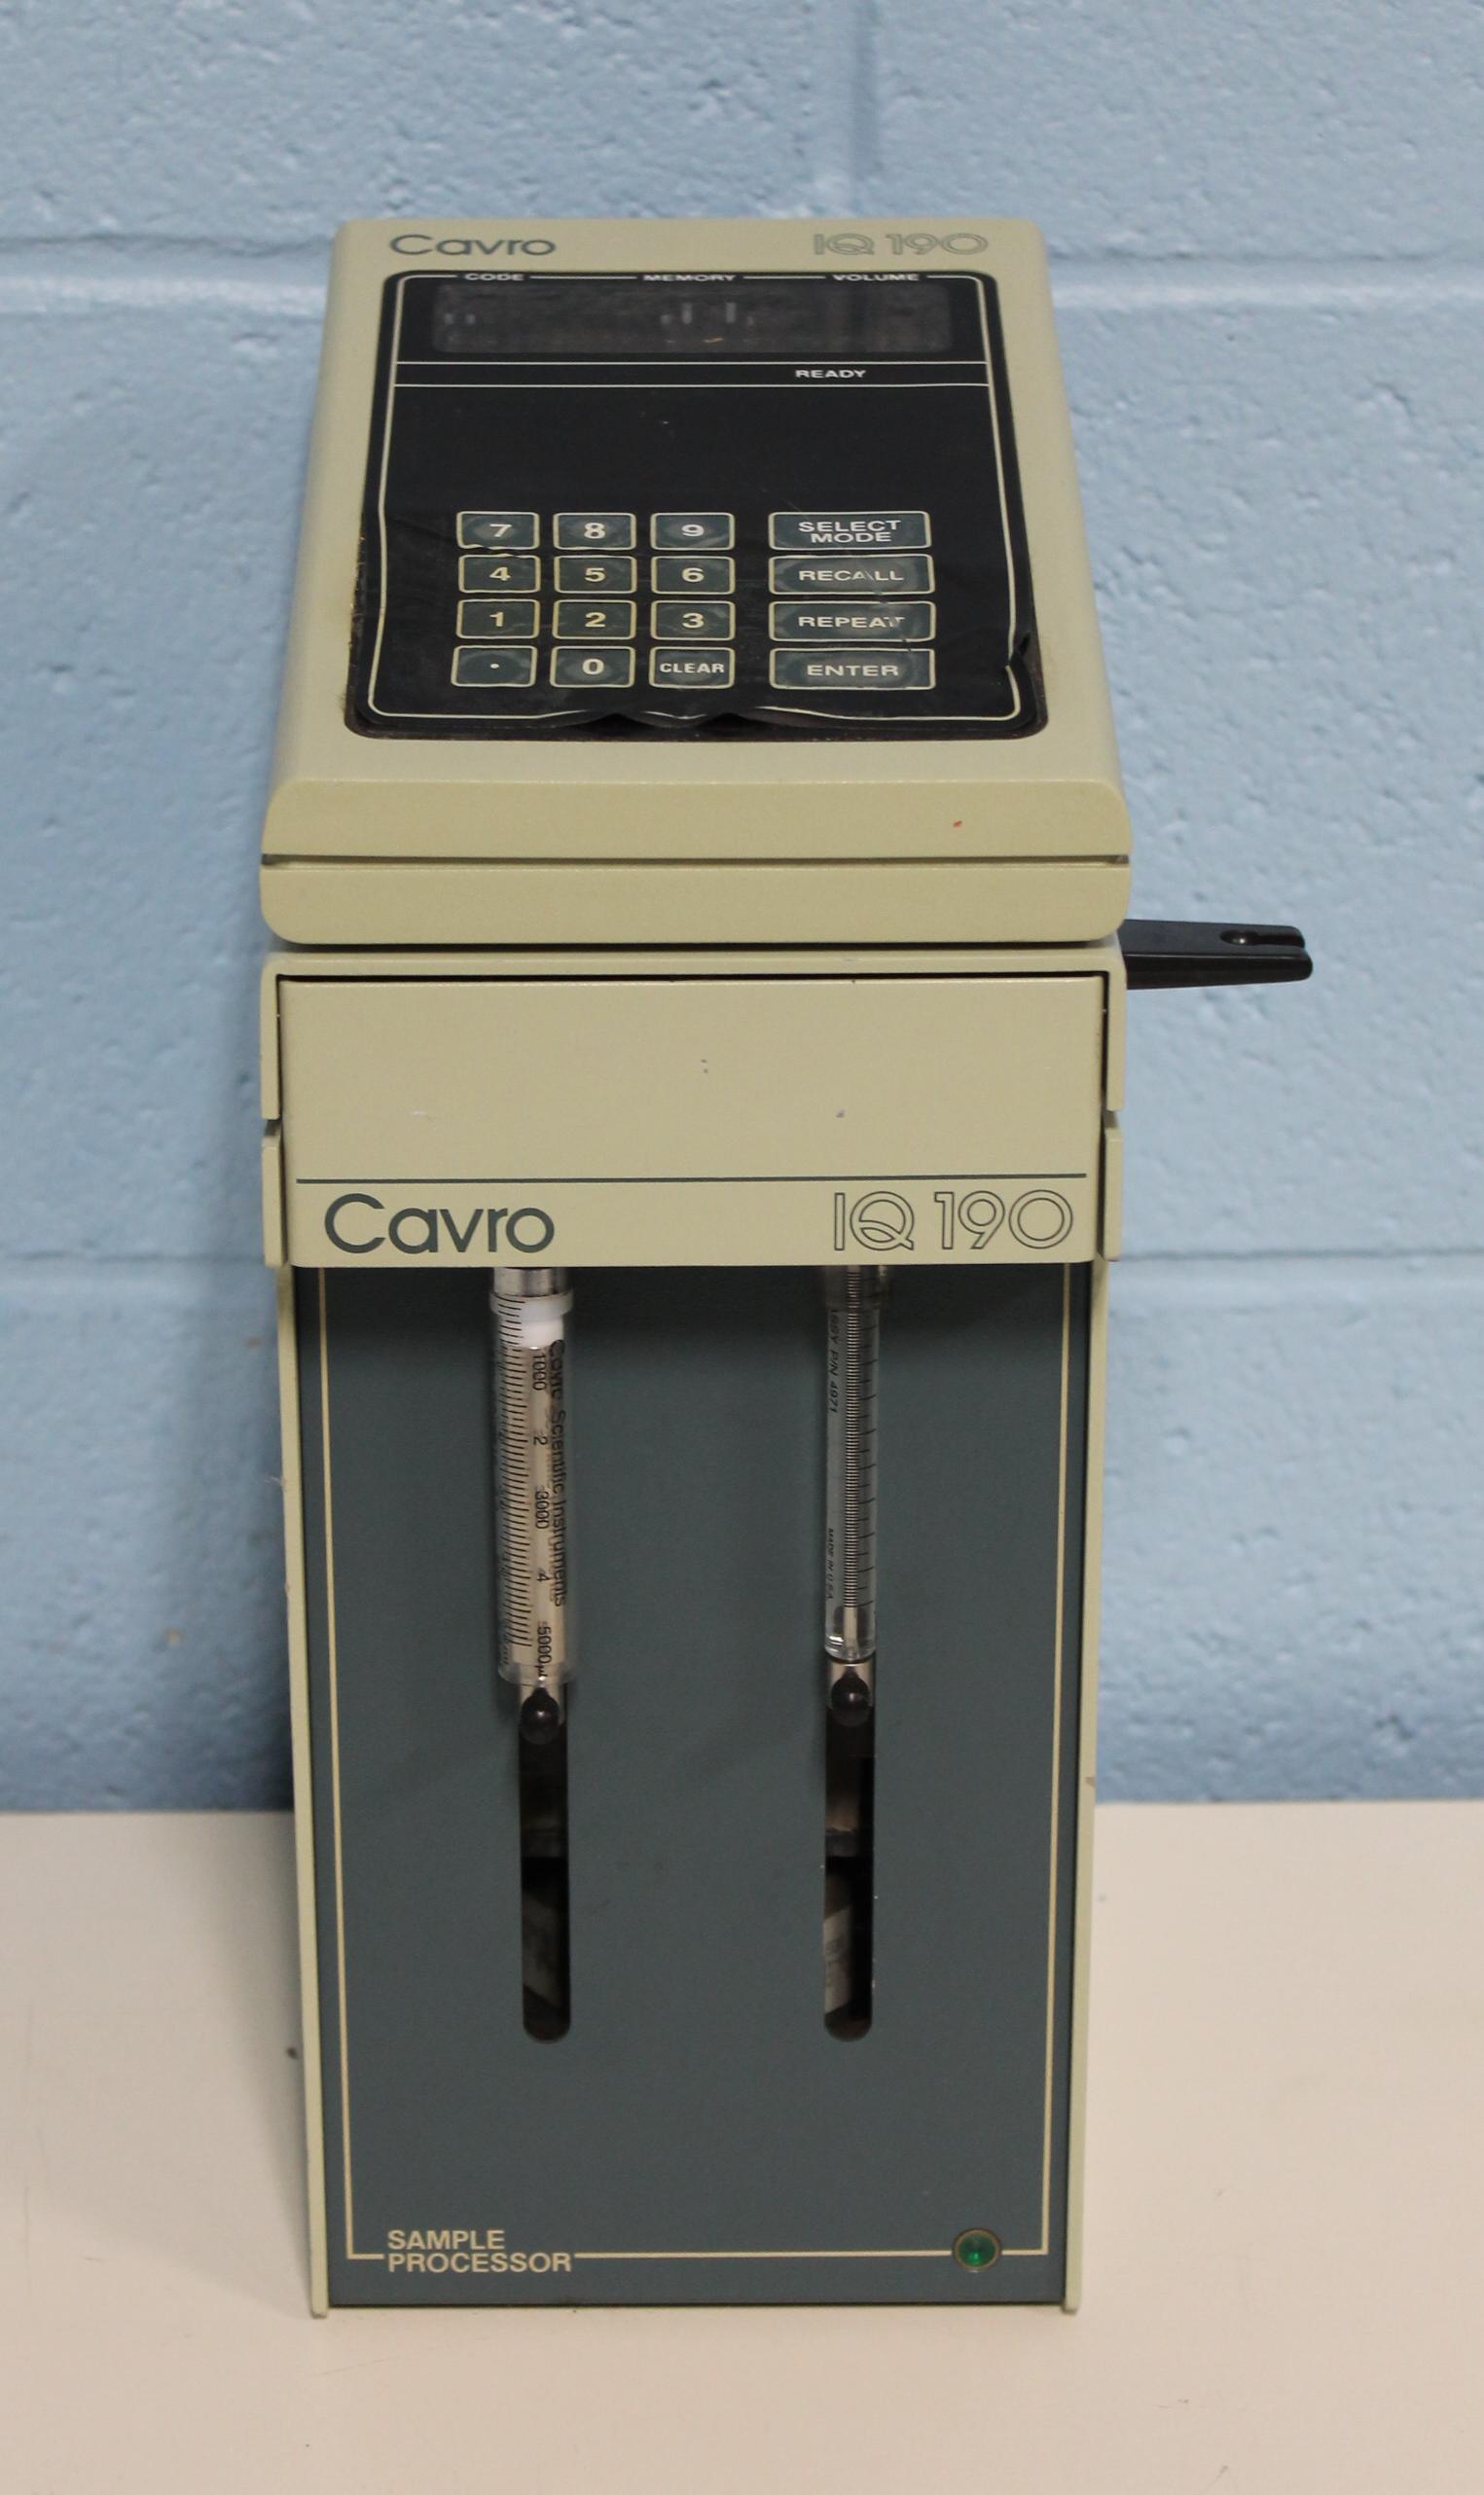 Cavro IQ190 Sampler Processor Image